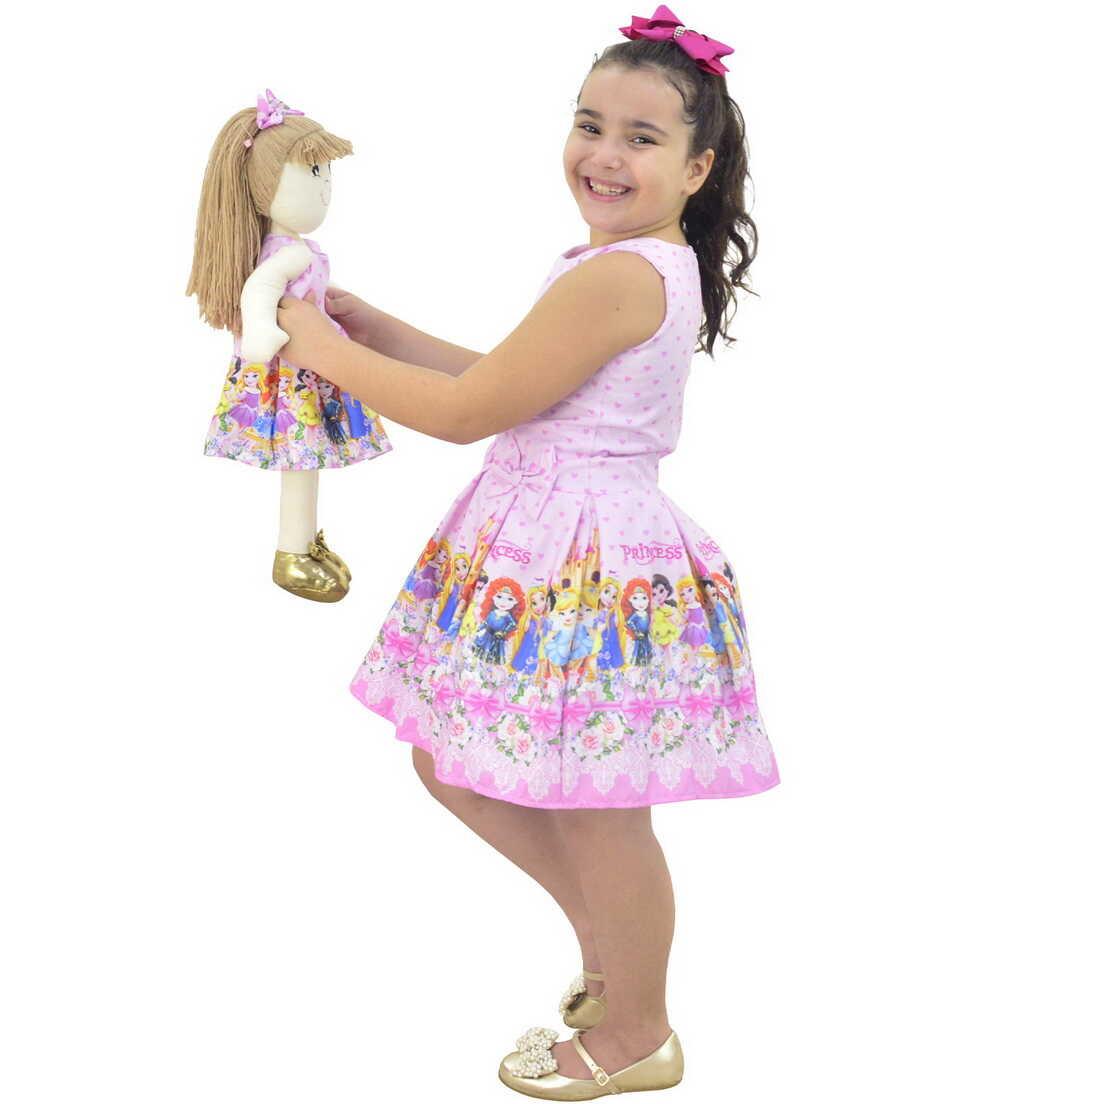 Tal Menina Tal Boneca Pri - Vestido Princesas Disney Cute